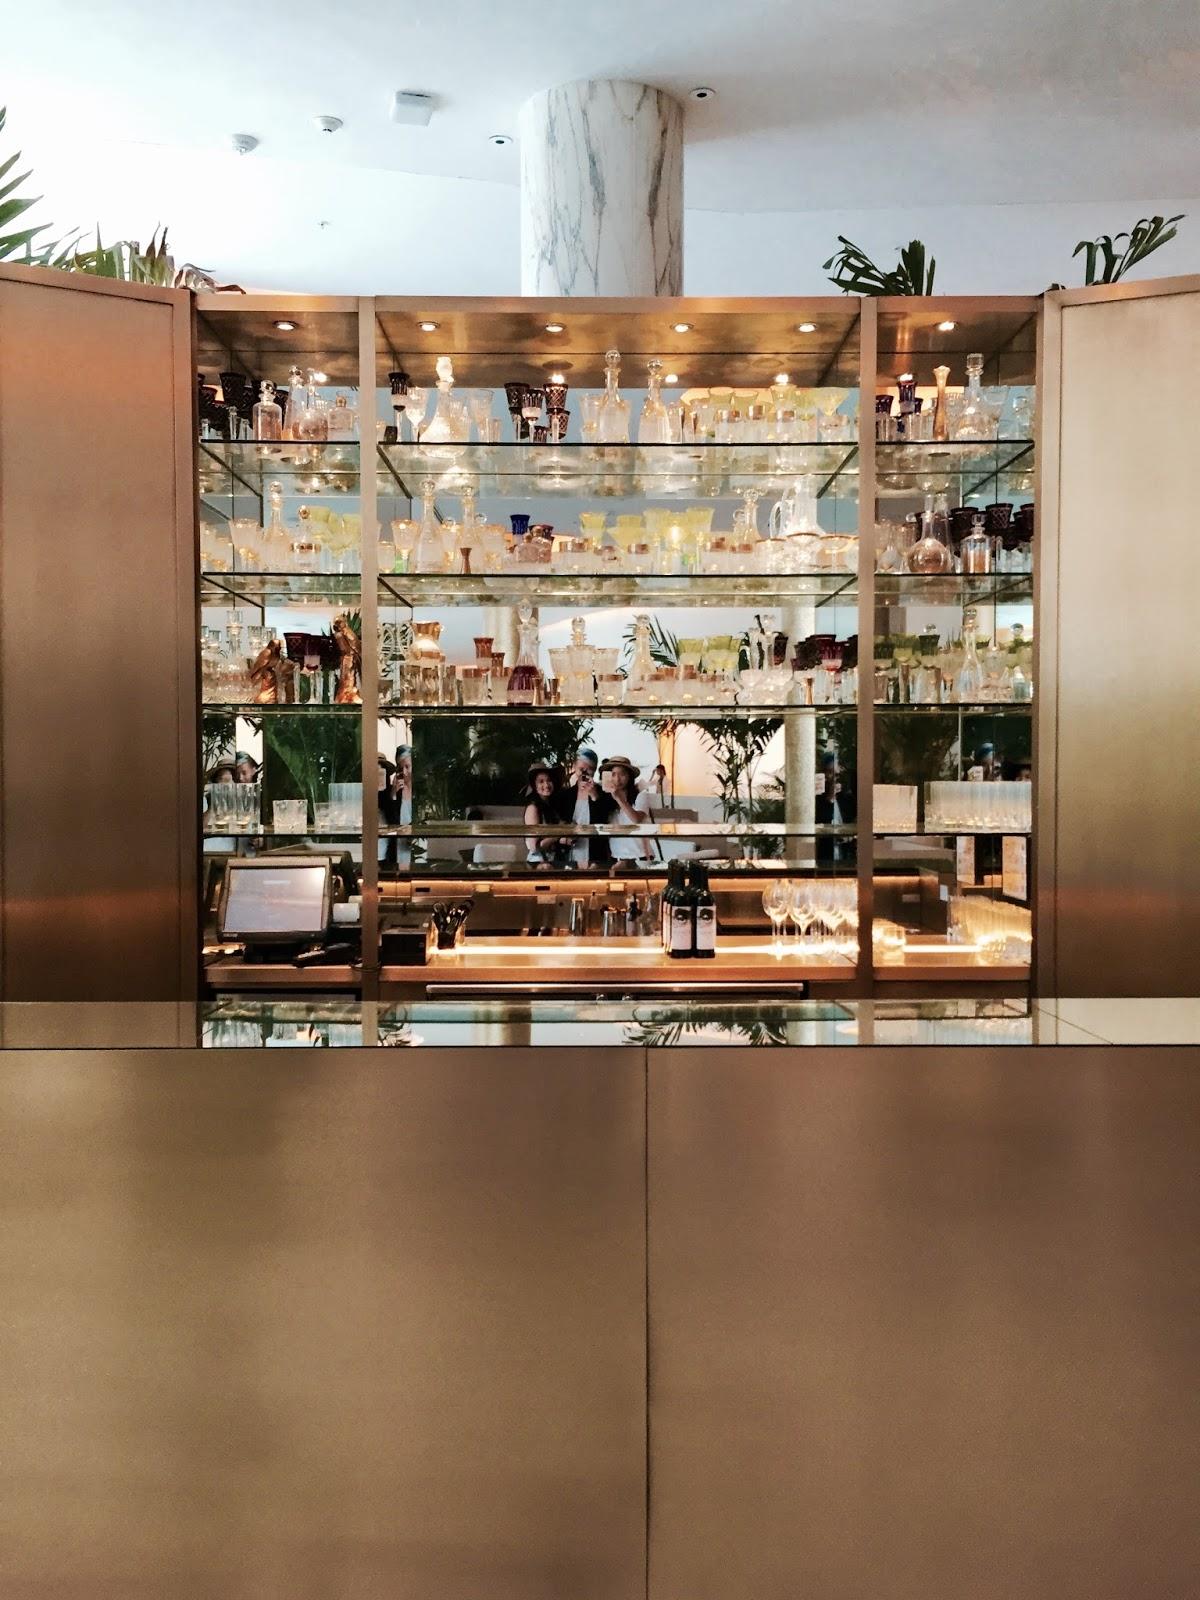 edition-hotel-miami-gold-bar.jpg